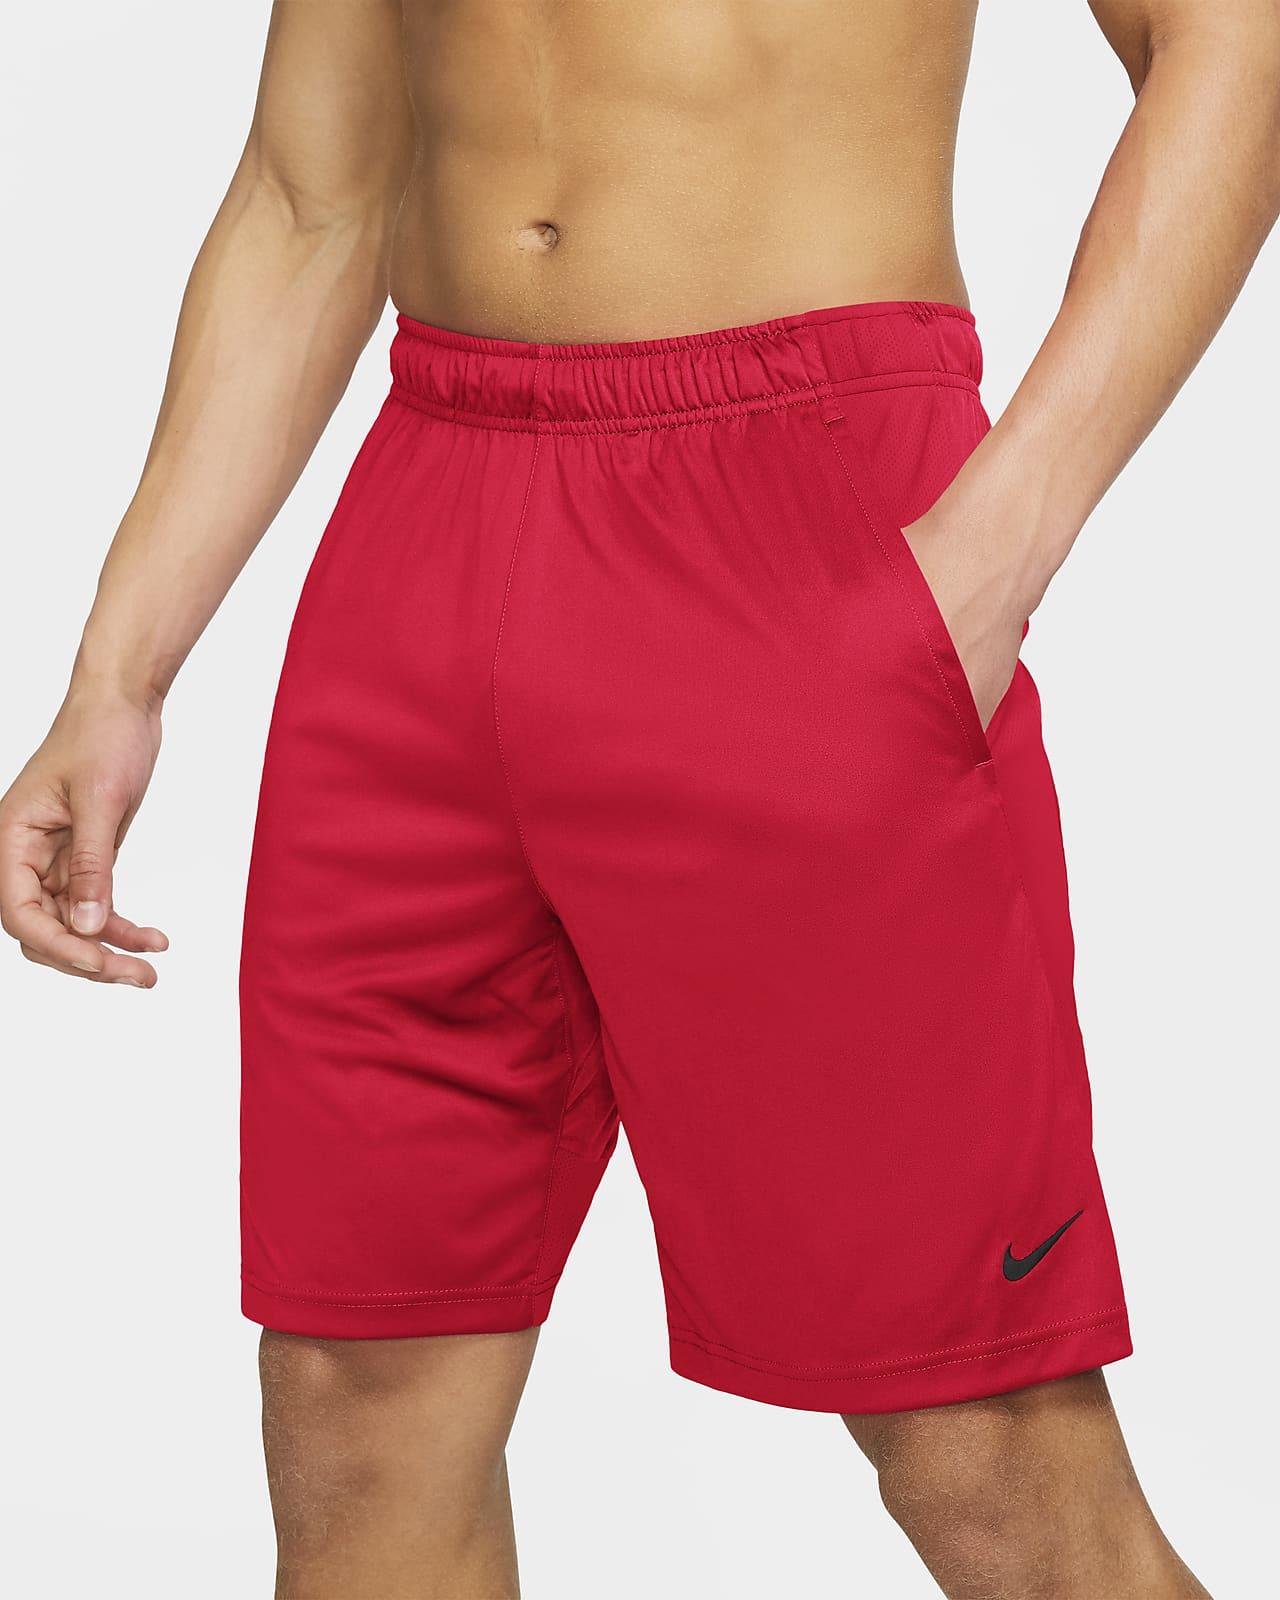 Nike Pro Compression Training Shorts New Size XS to Medium Comfortable Dri-Fit